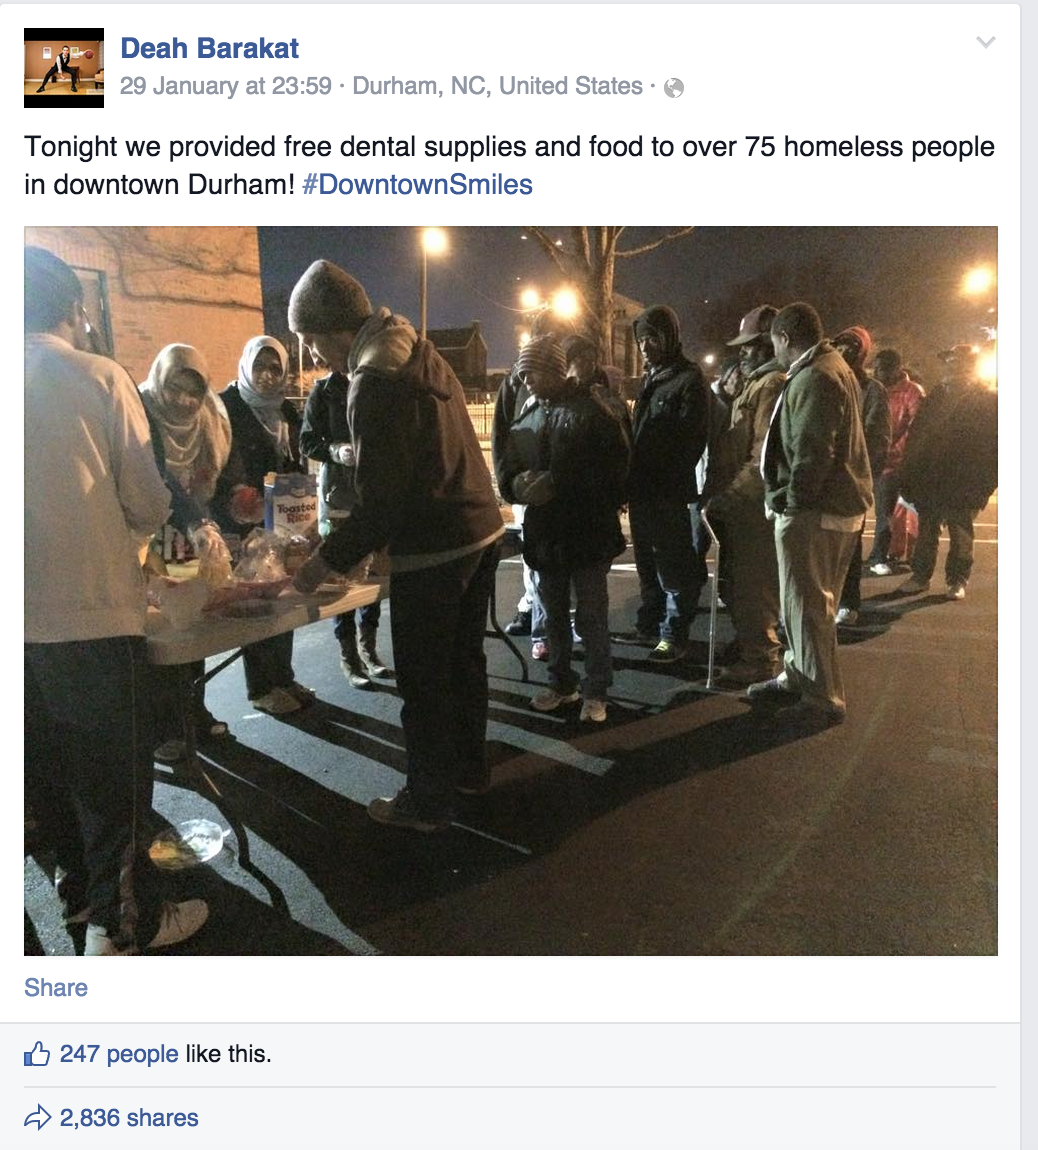 Beautiful & Sad. @OwenJones84: The last Facebook post of Deah Barakat, murdered in the #ChapelHillShooting http://t.co/xOM3iaVk5W